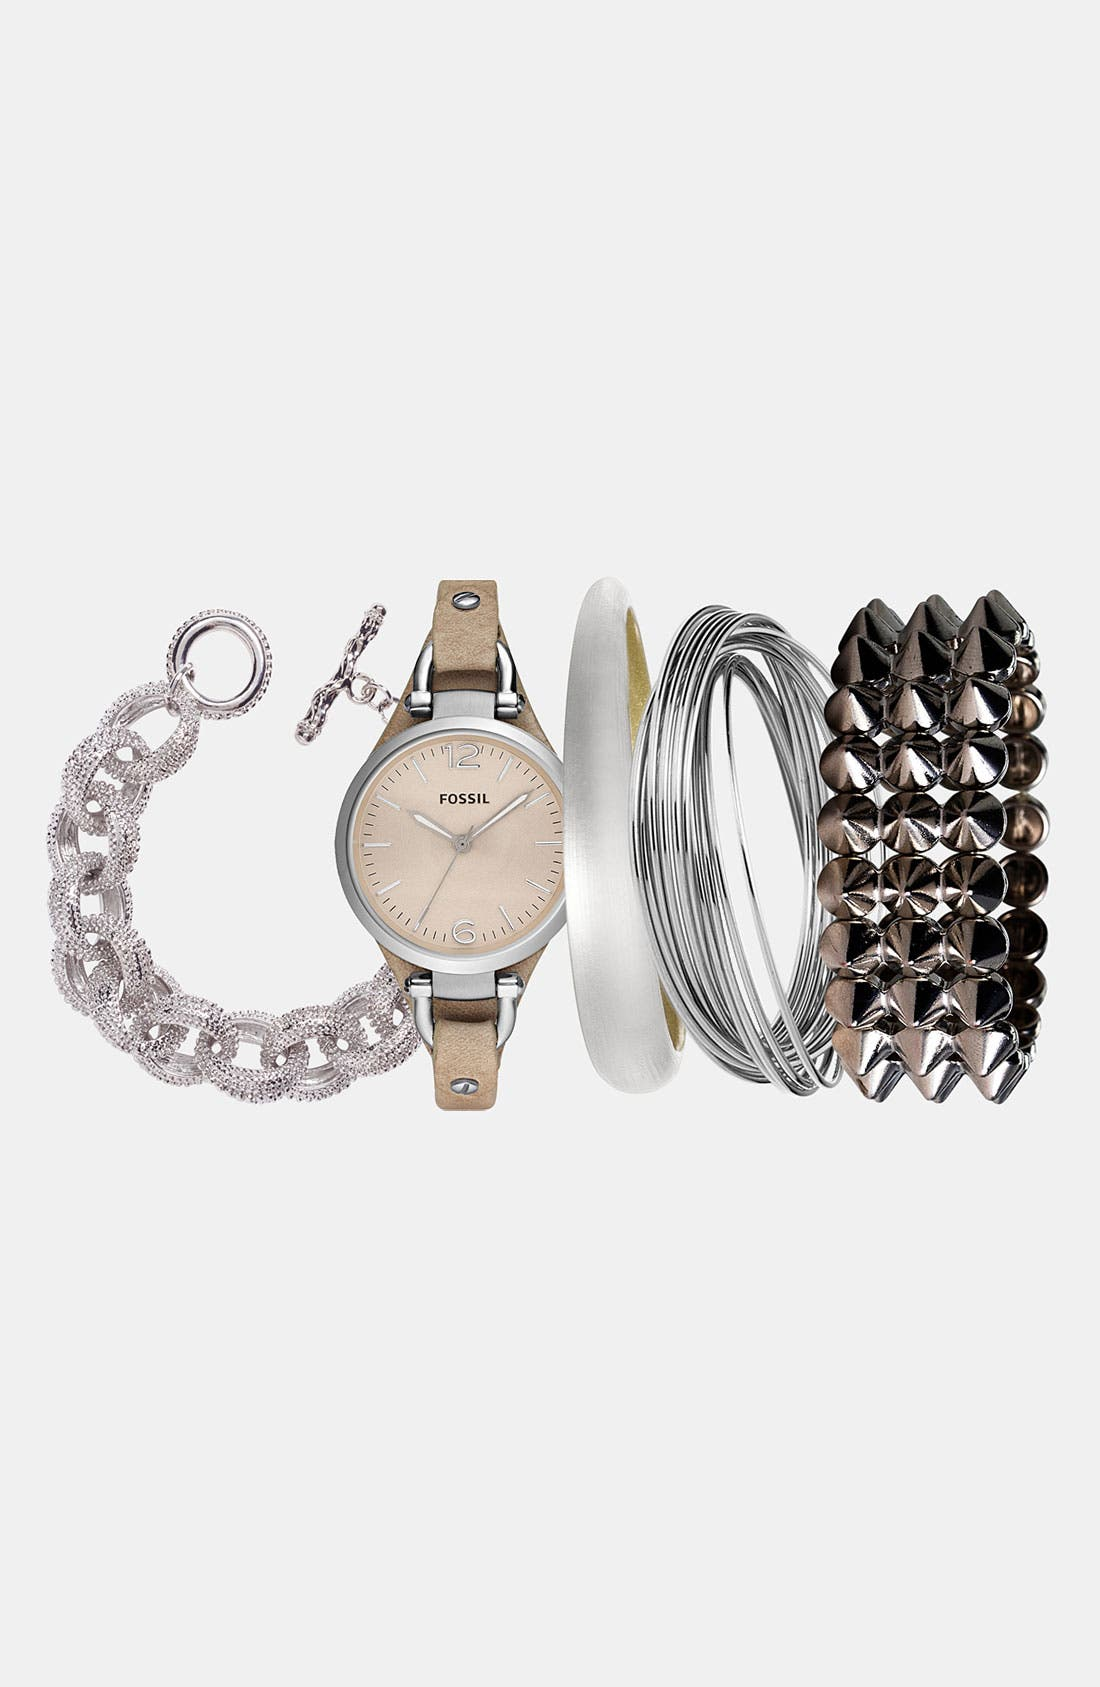 Main Image - Fossil Watch & Alexis Bittar Bangle